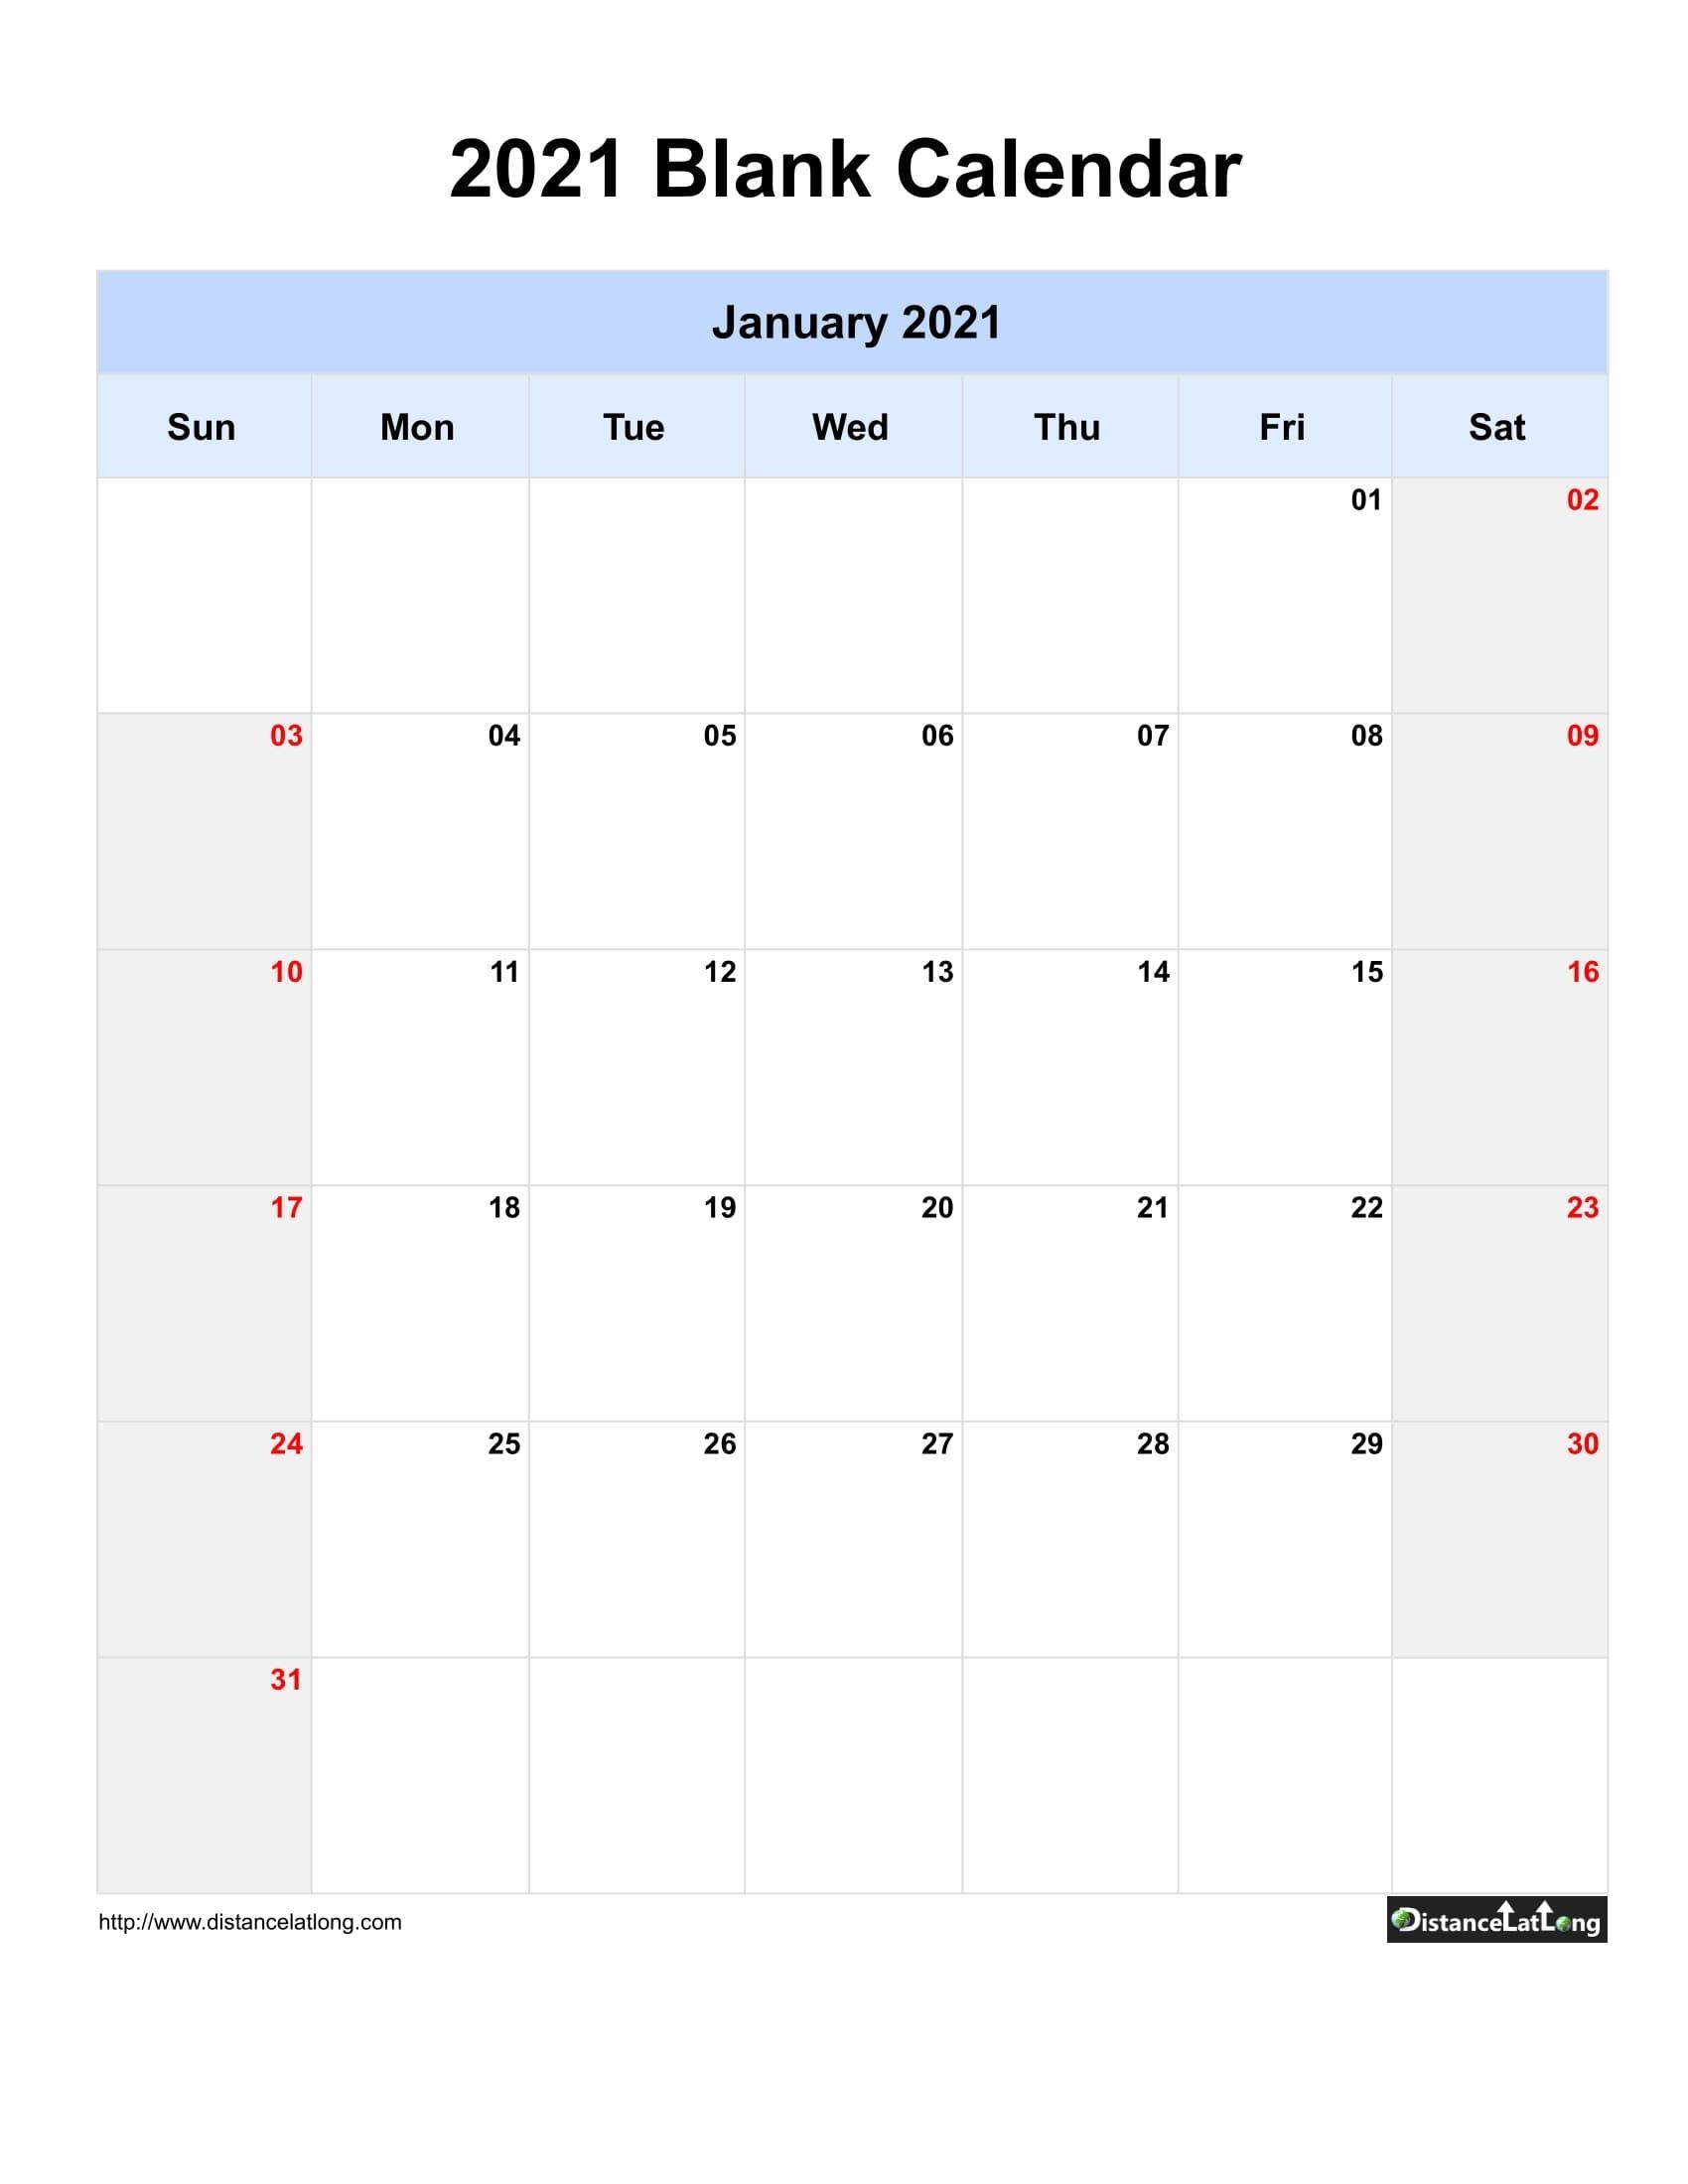 Printable Saturdays Of 201 And 2021 | Ten Free Printable in Blank 2021 Calendar Printable Free